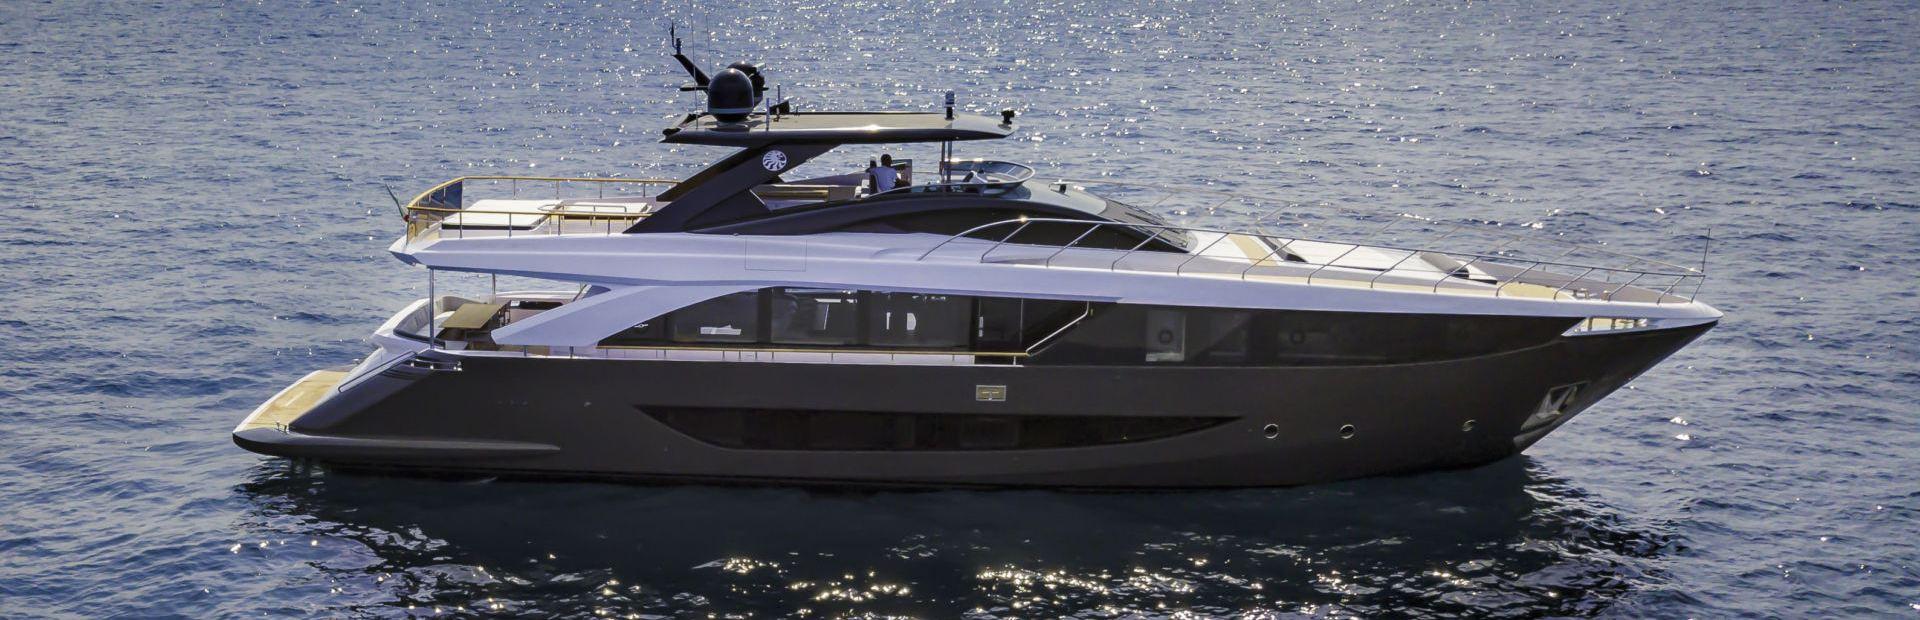 Amer Cento Quad Yacht Charter